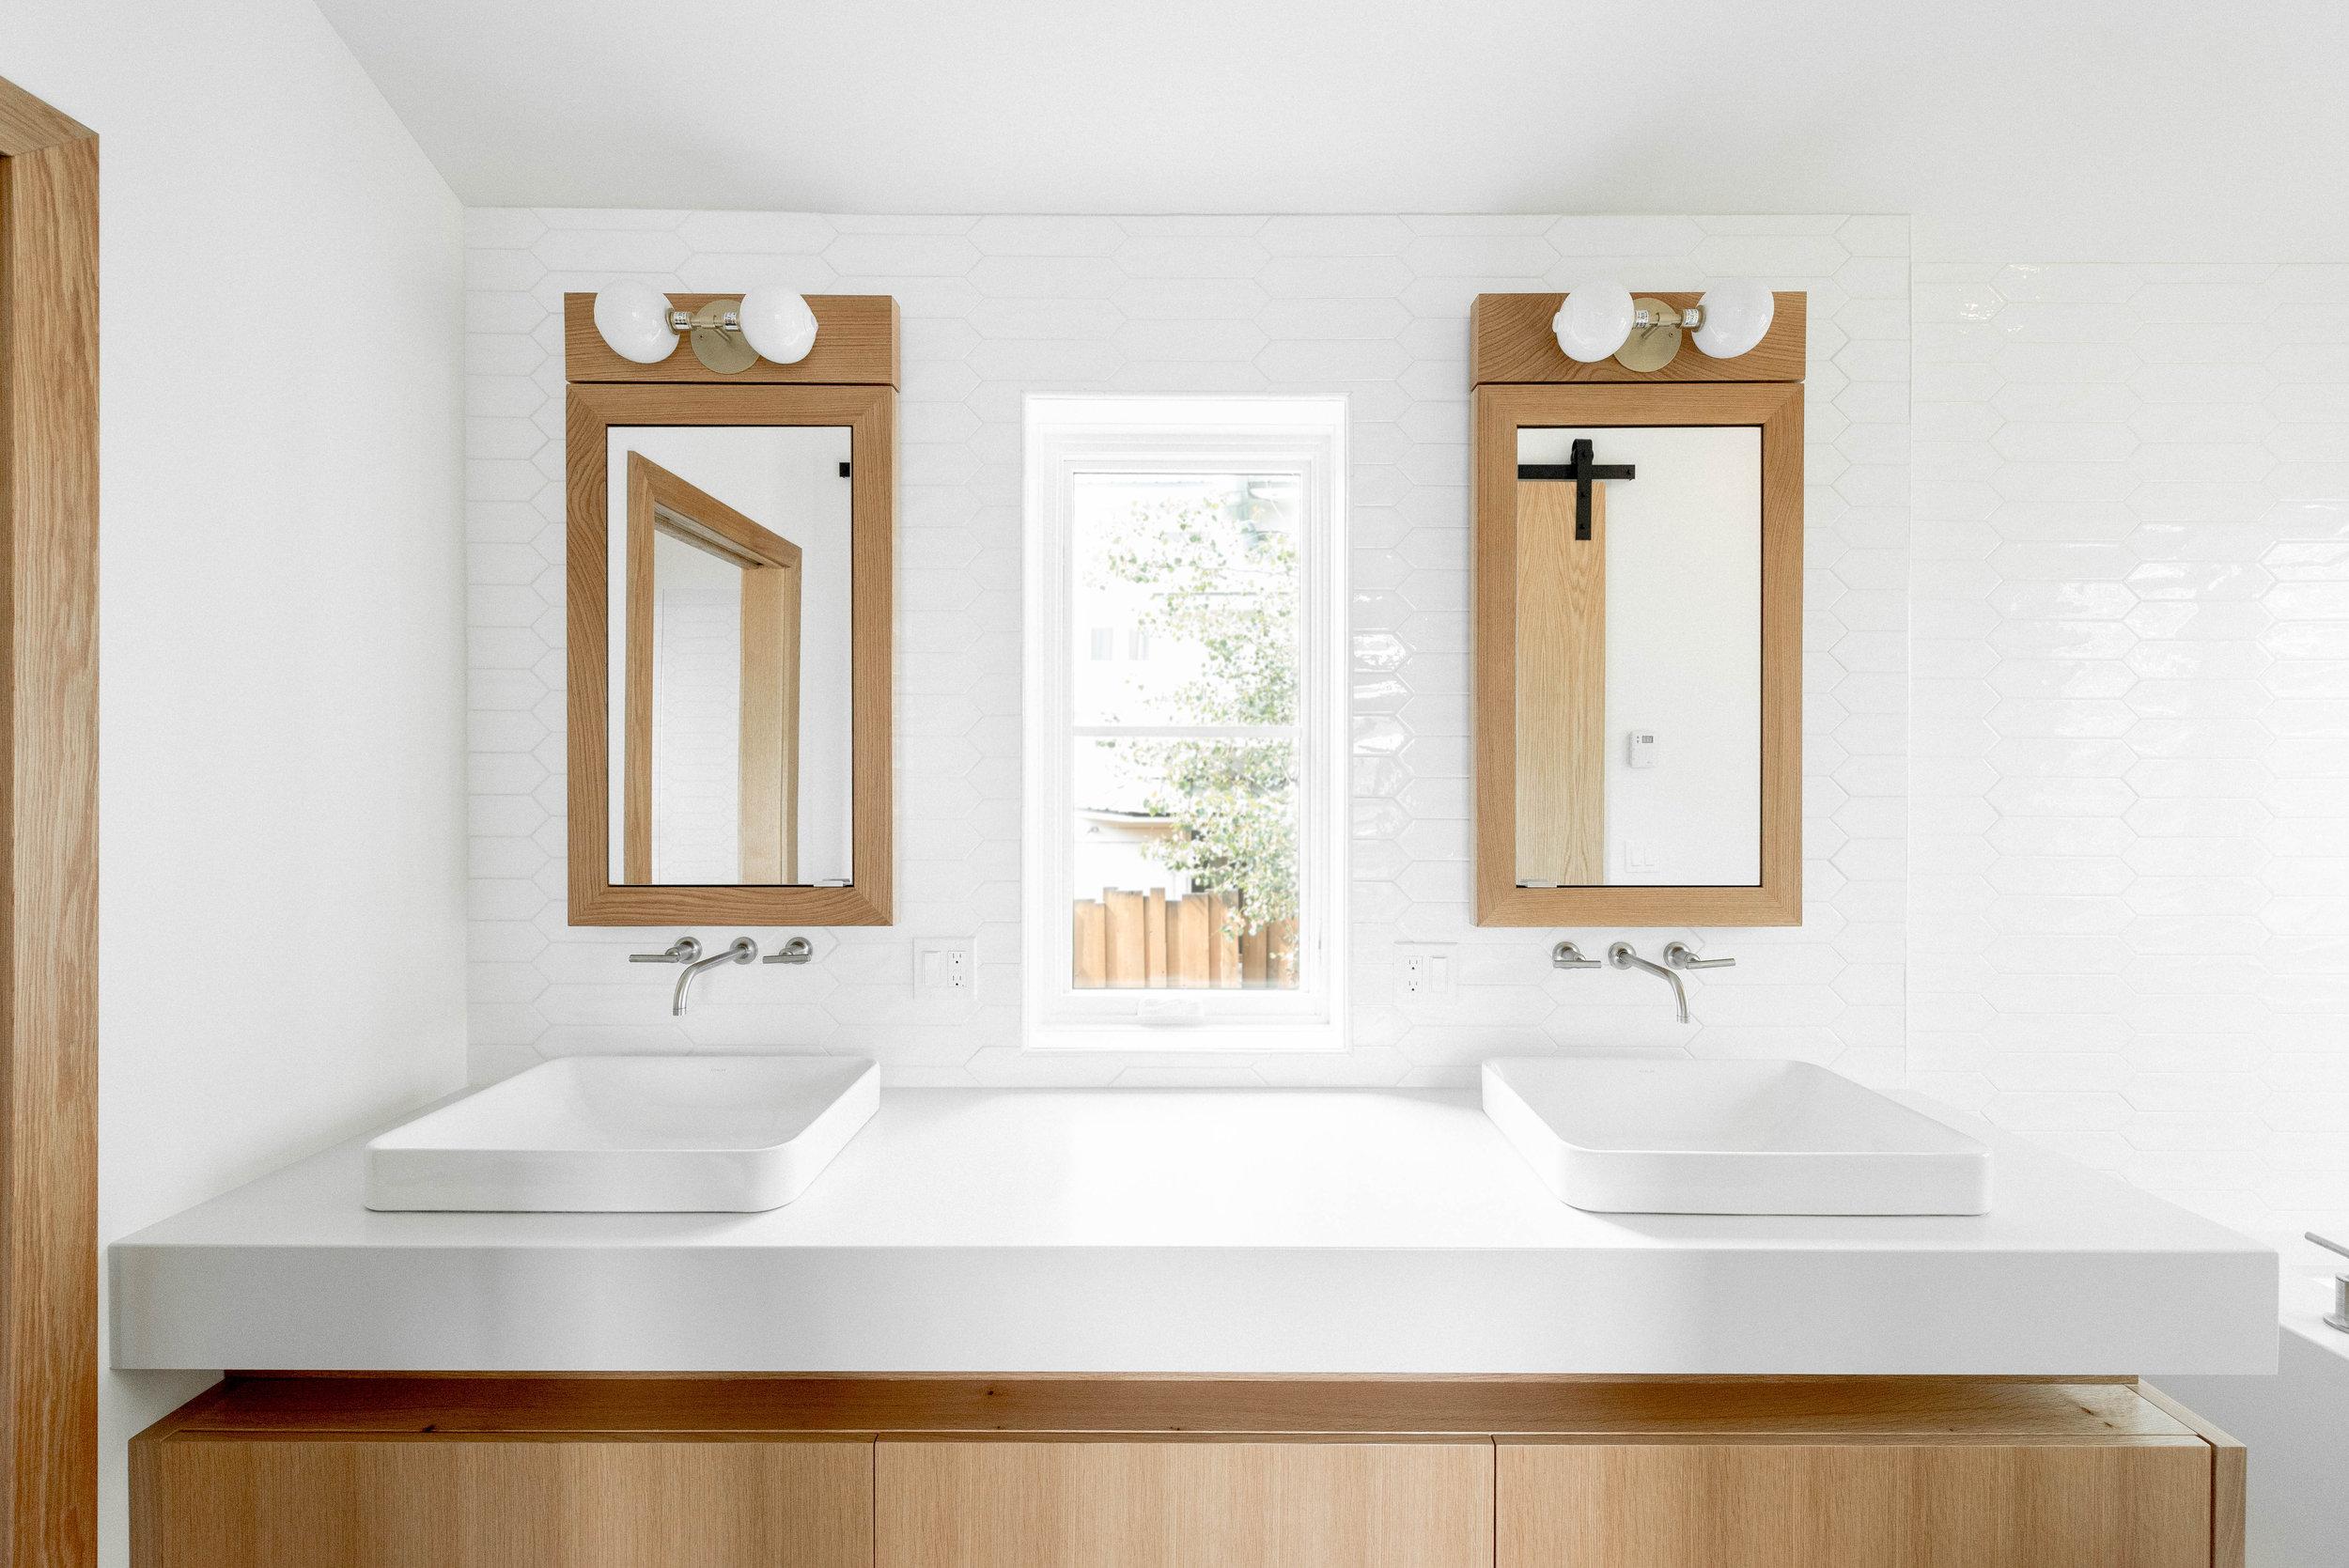 Woodside - A Scandinavian Inspired Interior